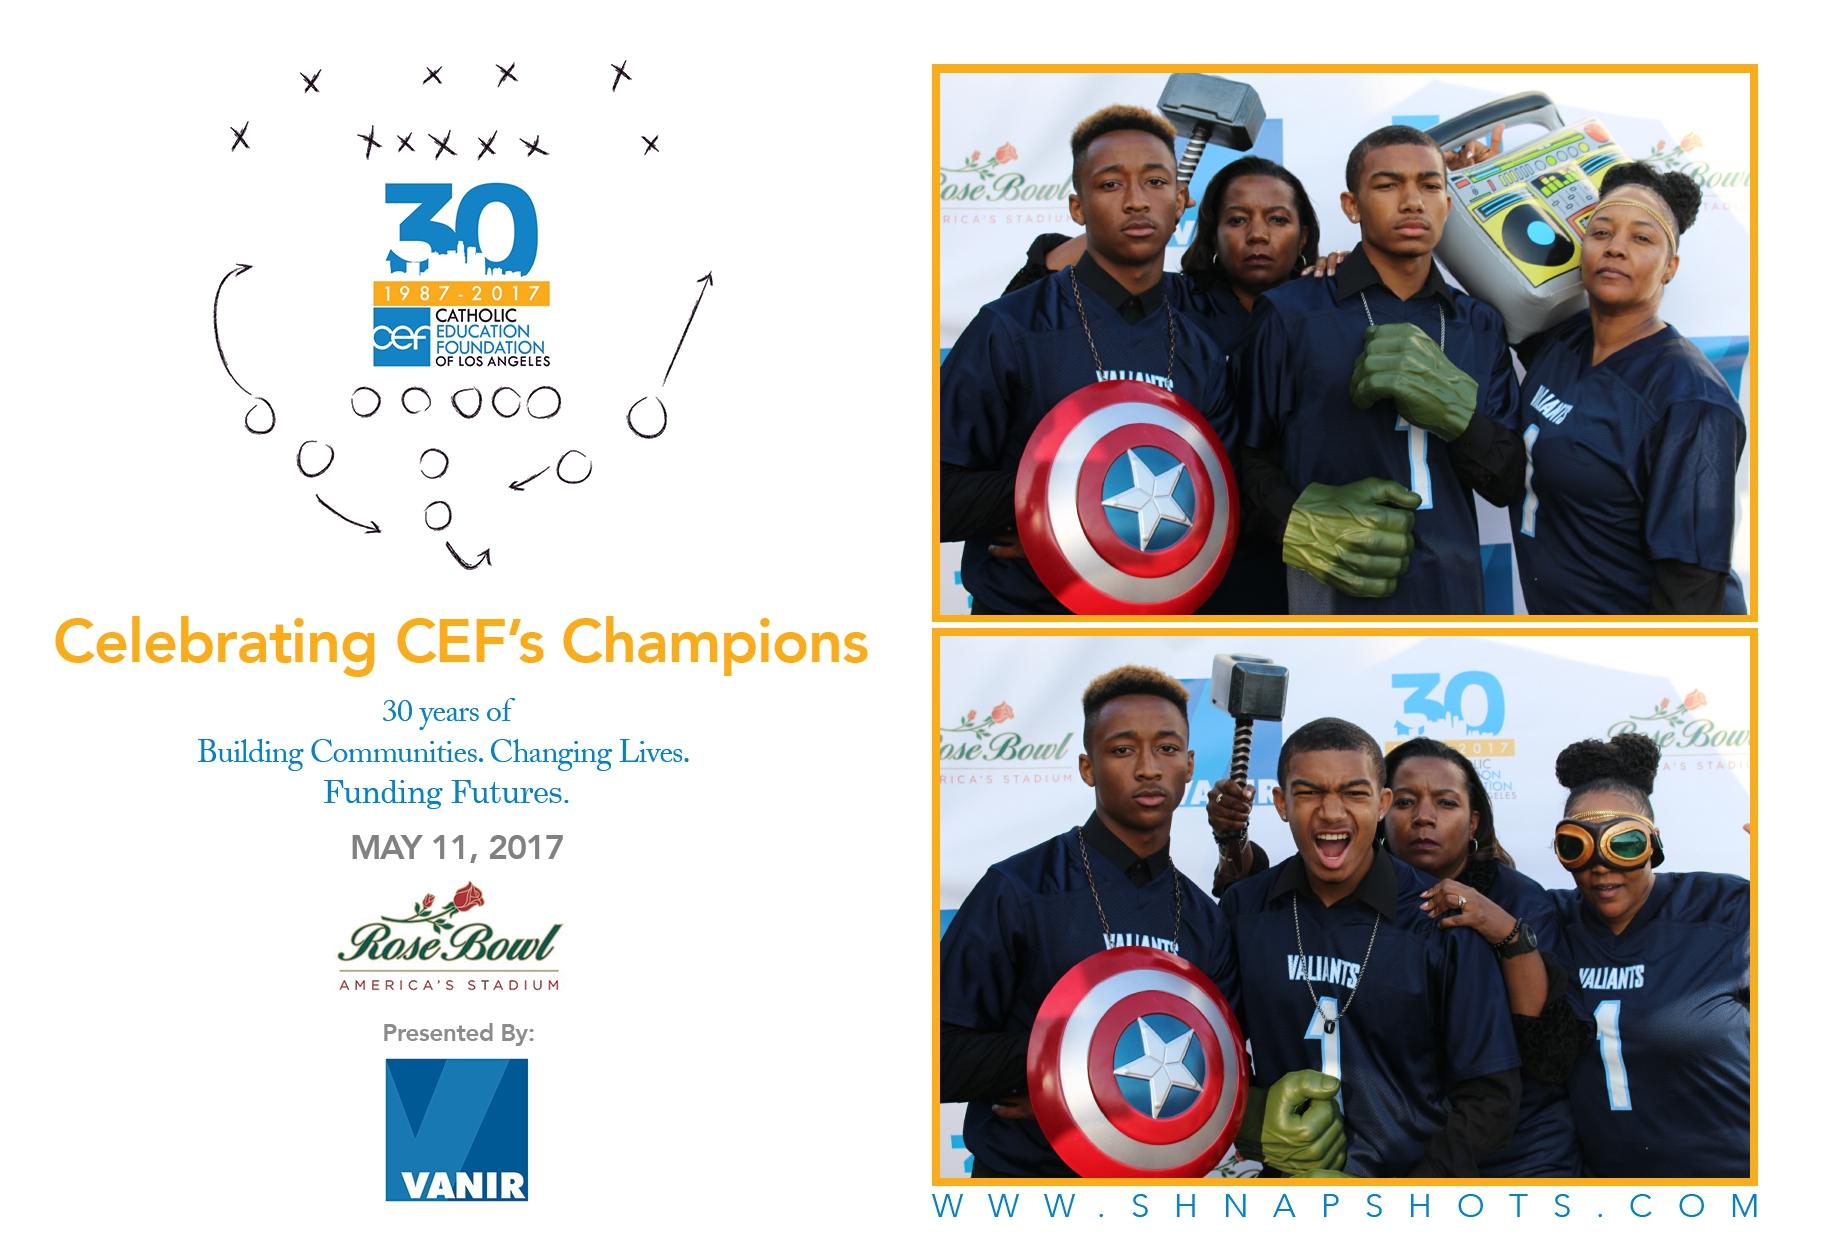 Celebrating Champion's - CEF